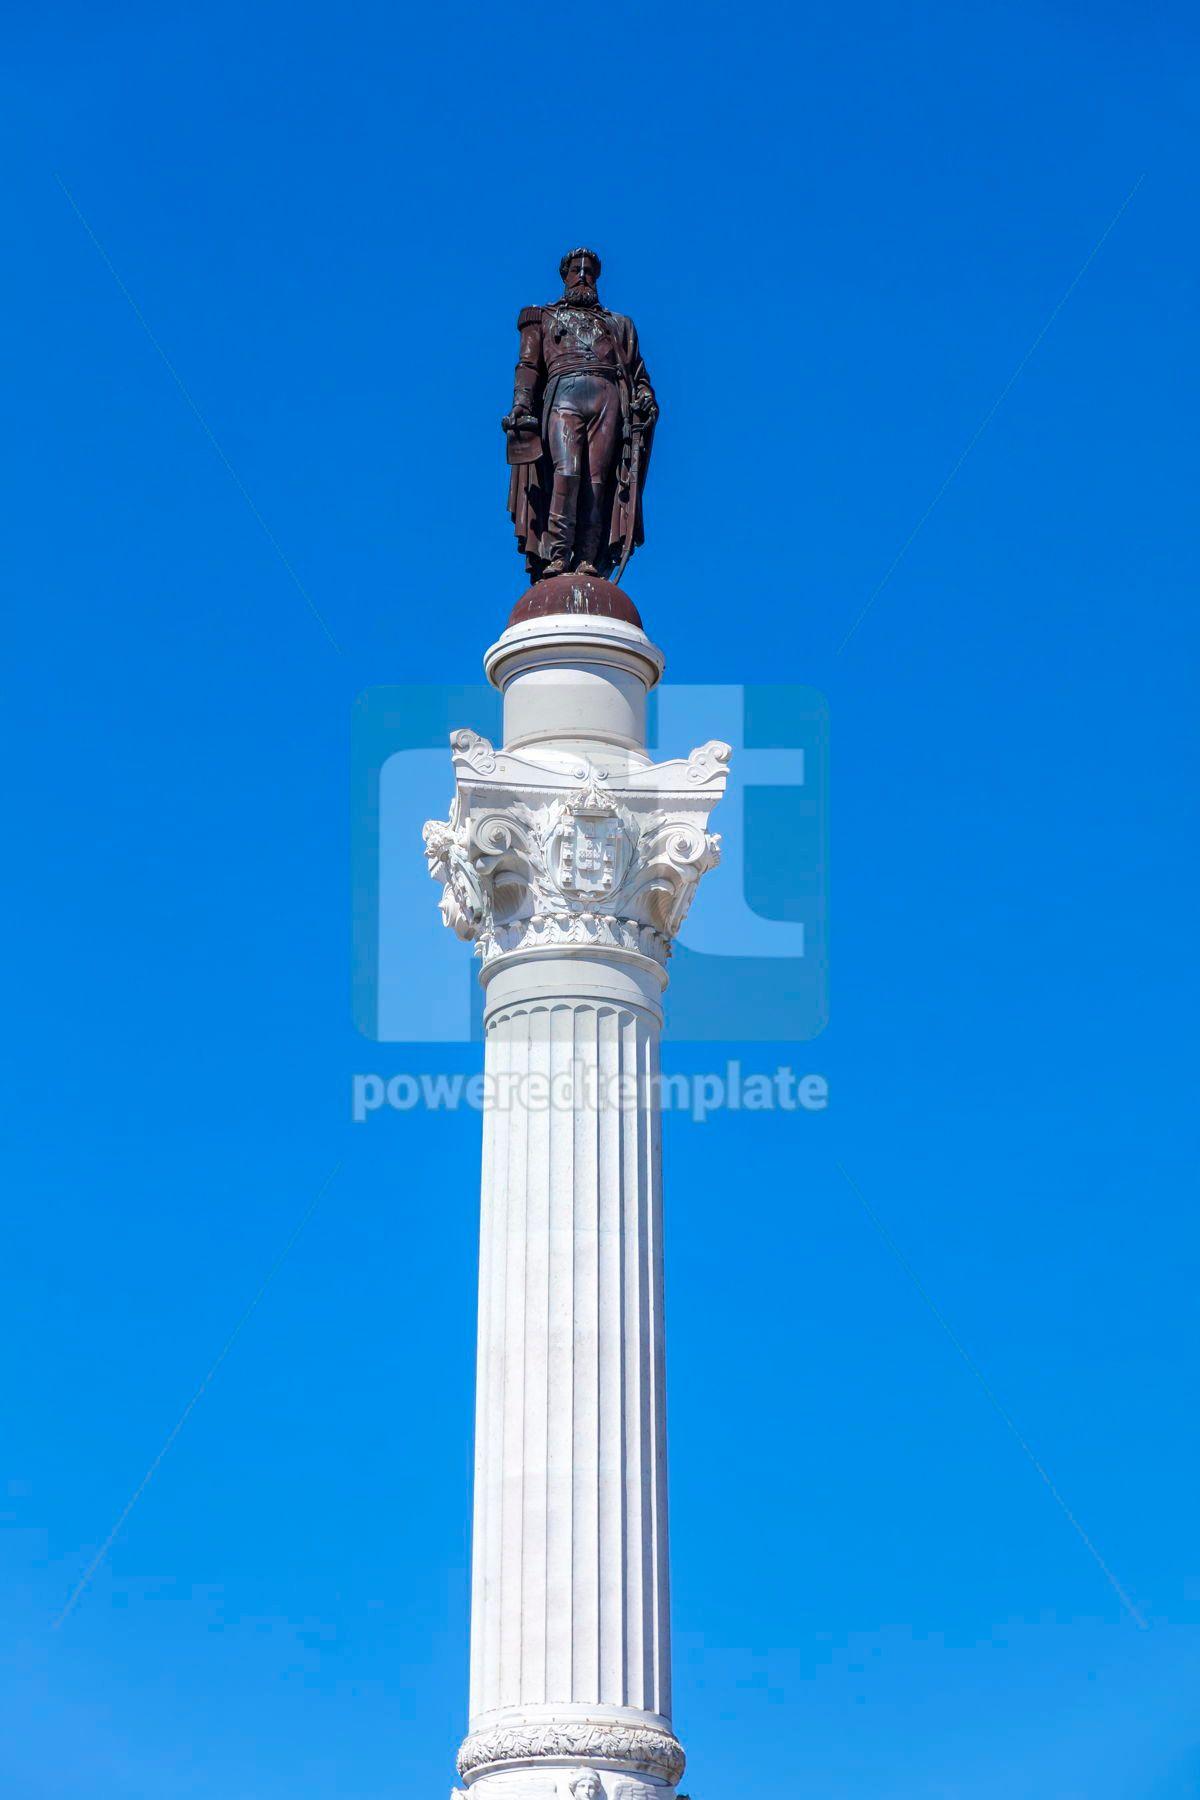 Marble statue of Pedro IV on Rossio square Lisbon Portugal, 13370, Architecture  — PoweredTemplate.com